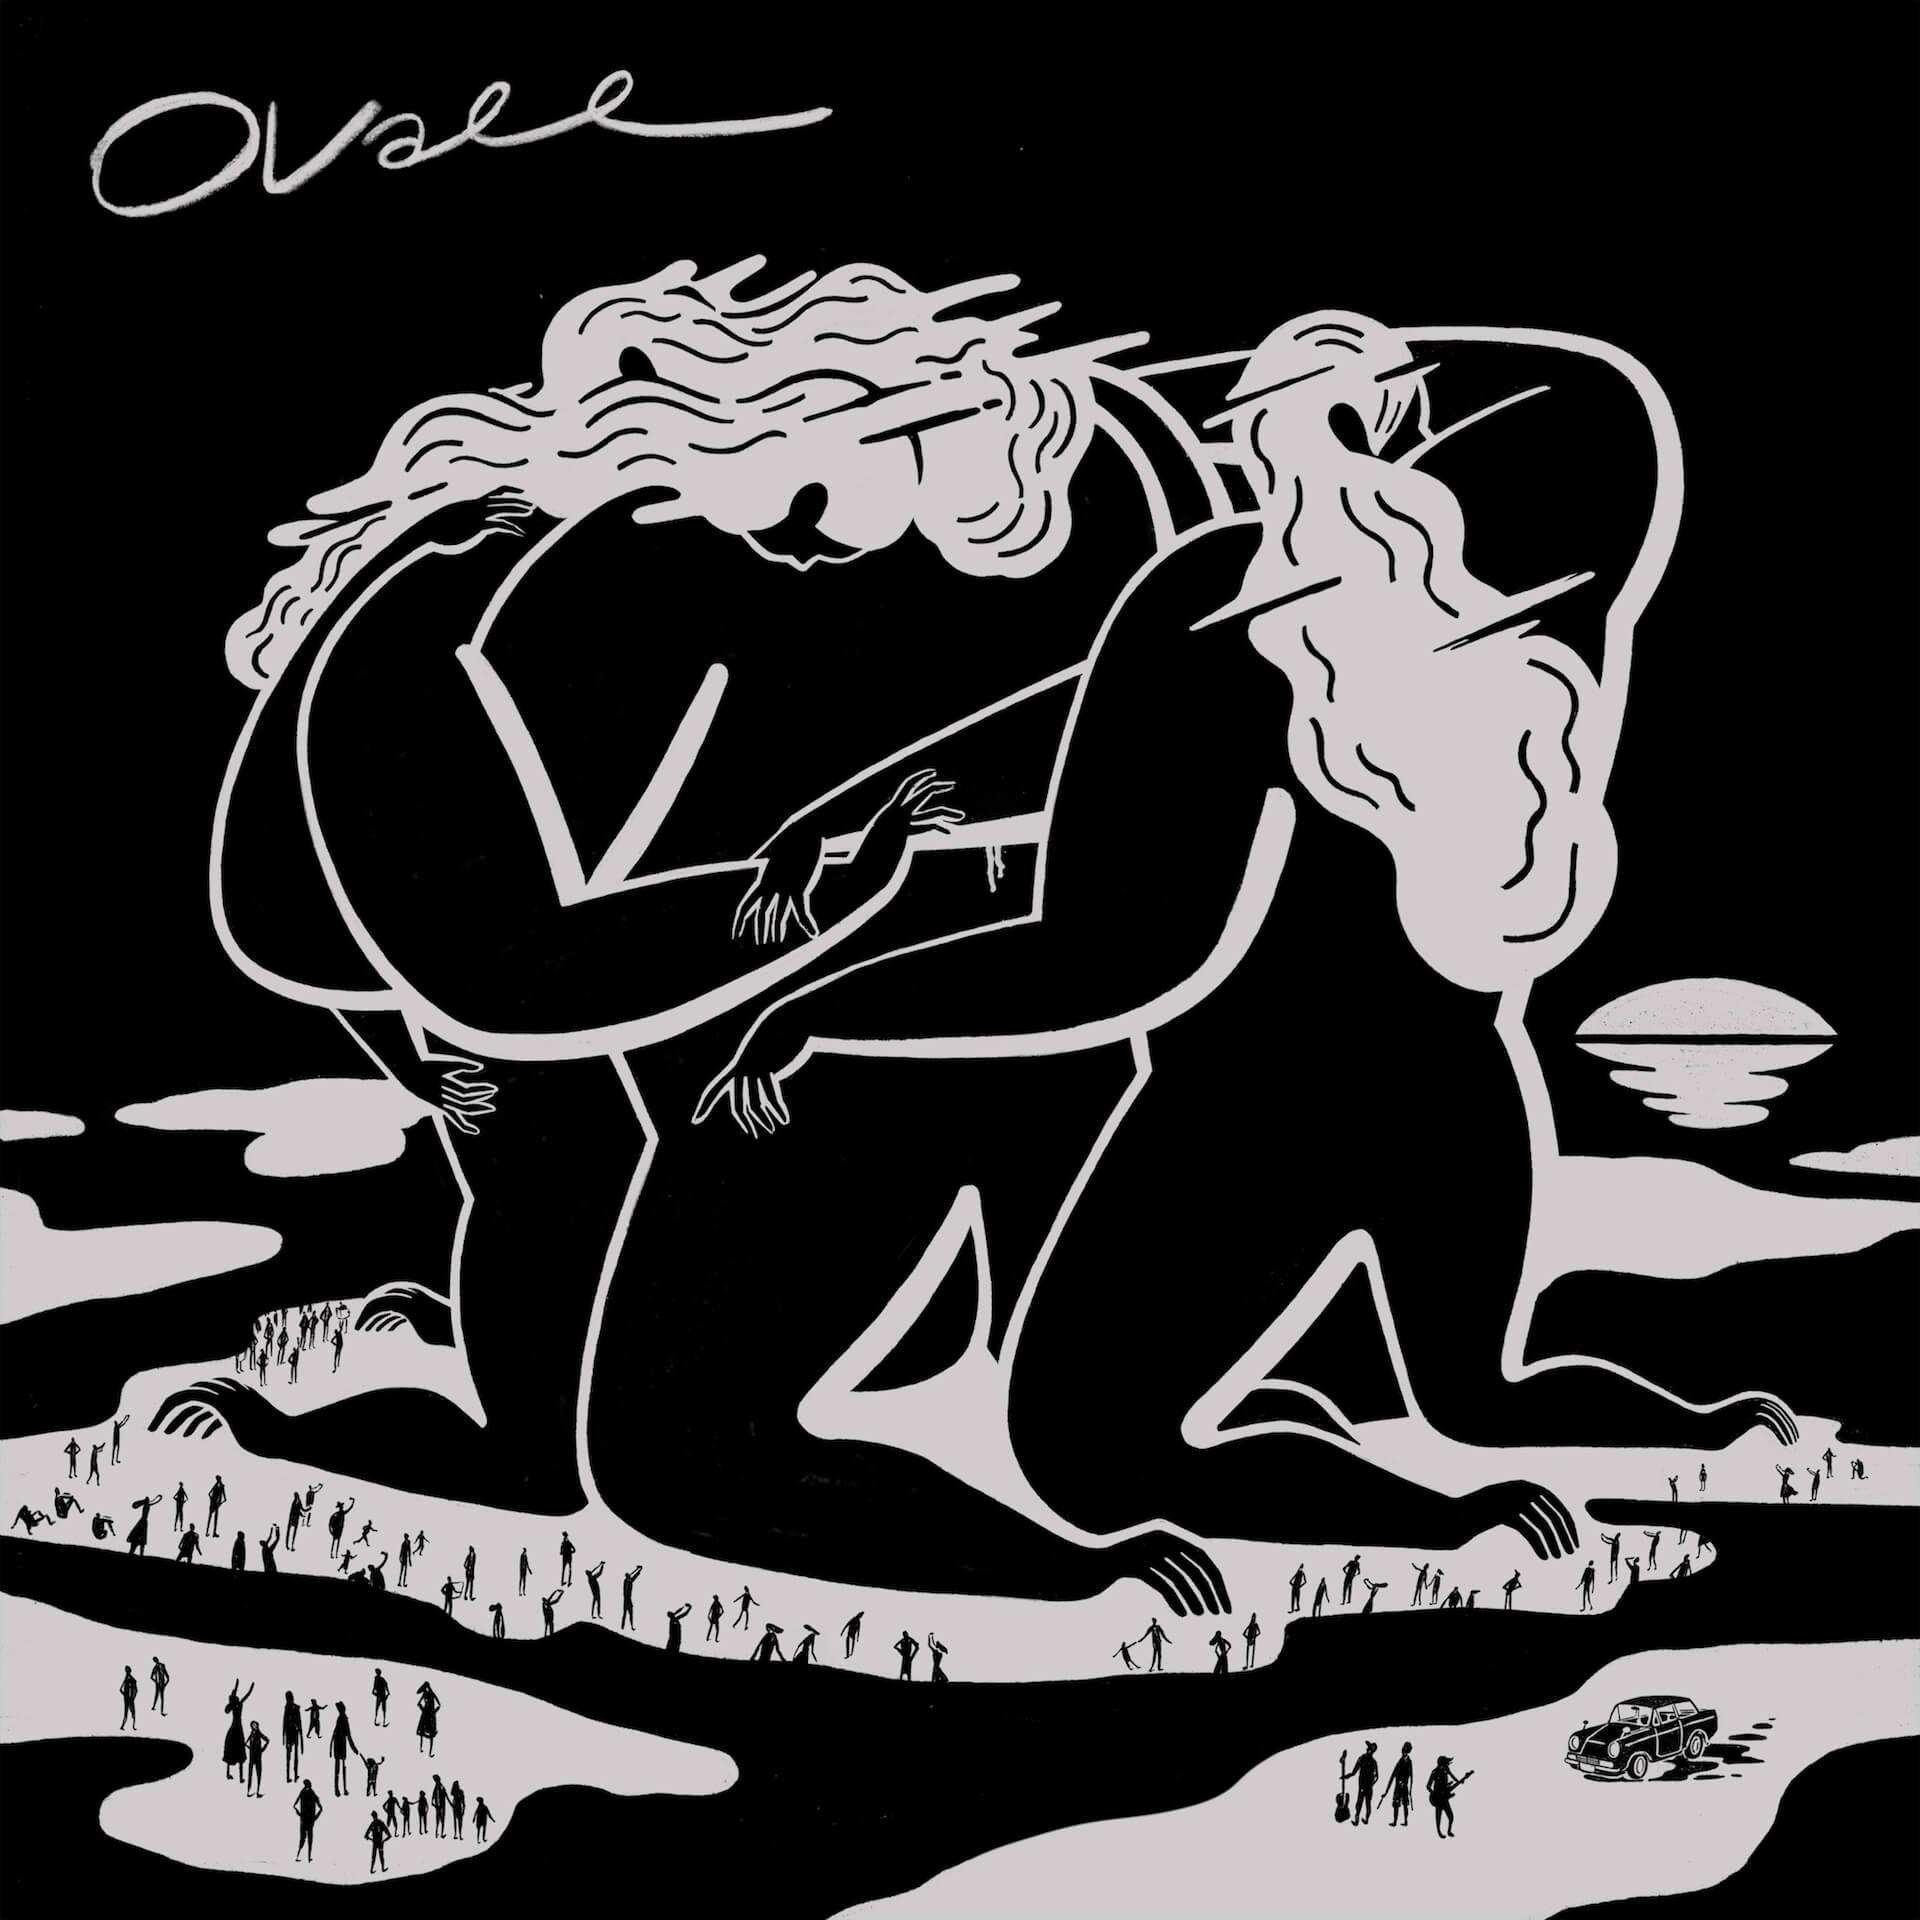 Ovall、最新のセルフタイトルアルバムをアナログ化|WONKのHIKARU ARATA、KENTO NAGATSUKAによる「Stargazer Rework」収録 music200117_ovall_lp_1